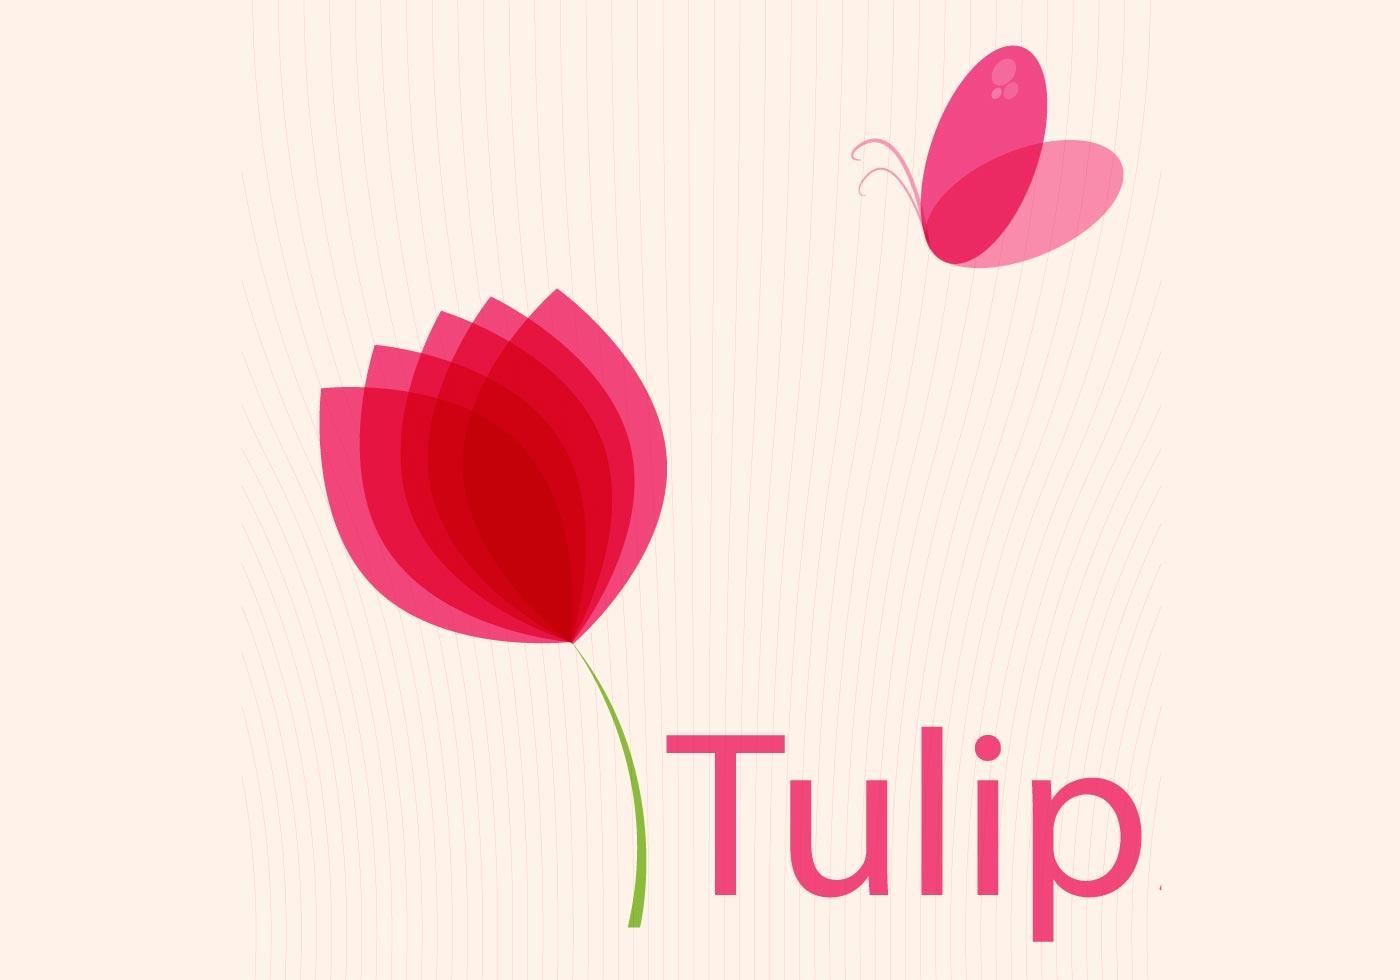 Tulip Time Art And Craft Fair